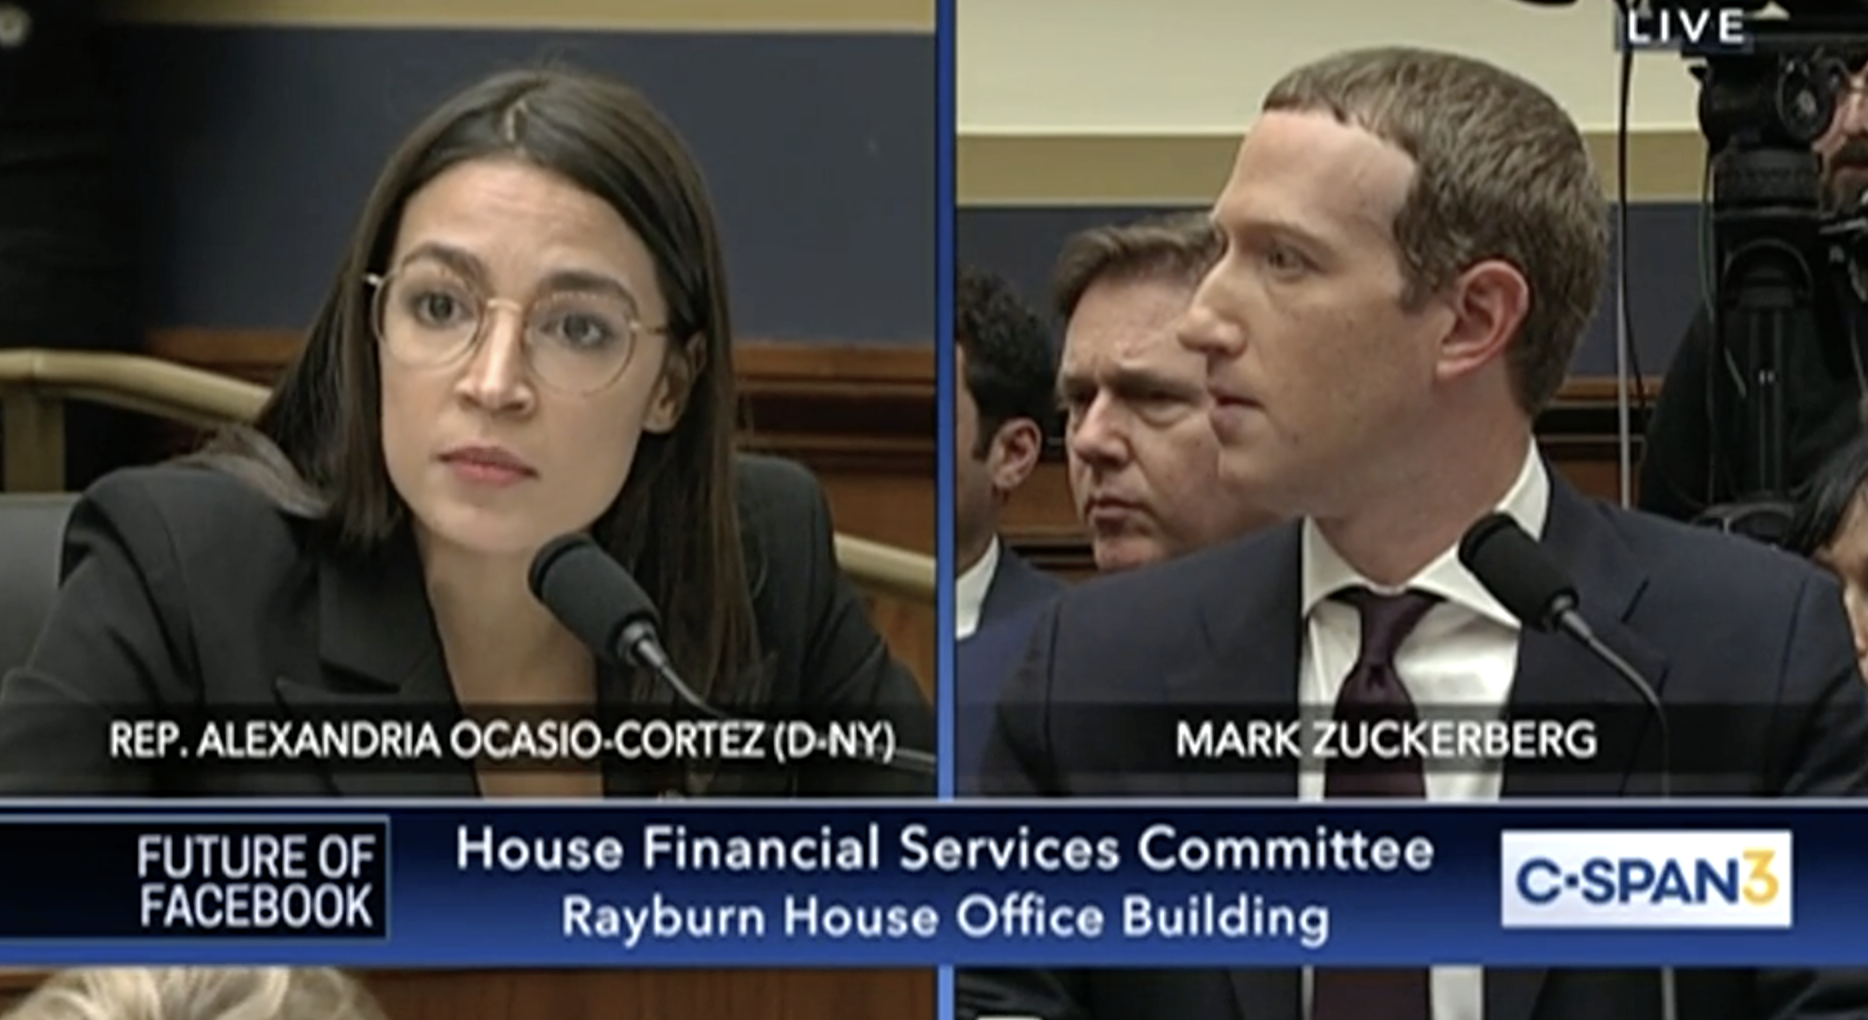 Mark Zuckerberg Falters Under AOC's Grilling: 'Lying Is Bad'